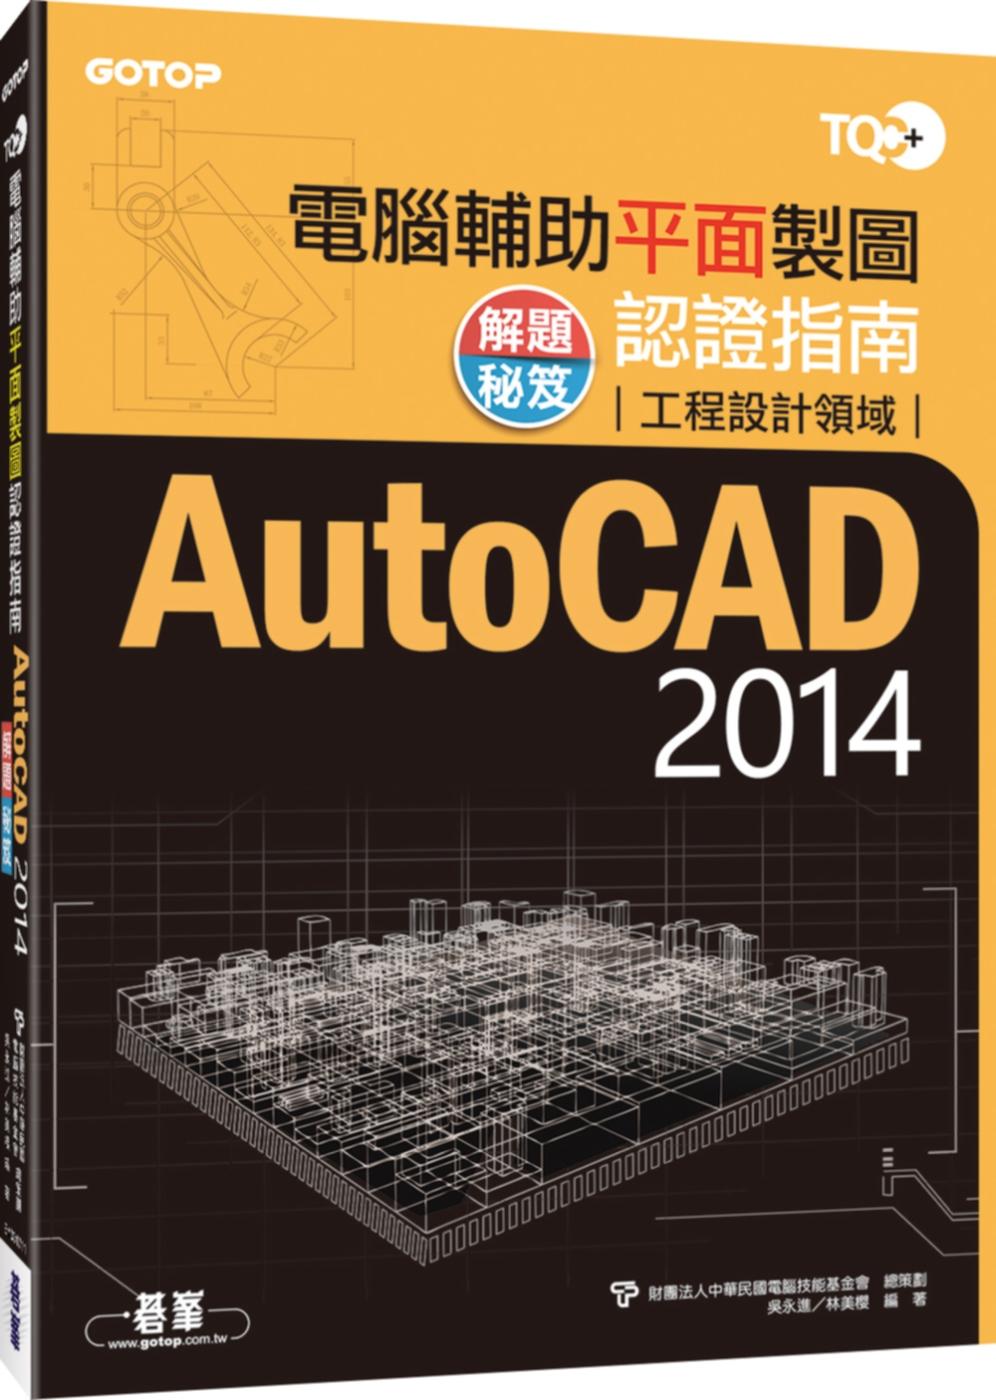 TQC+電腦輔助平面製圖認證指南解題秘笈AutoCAD 2014